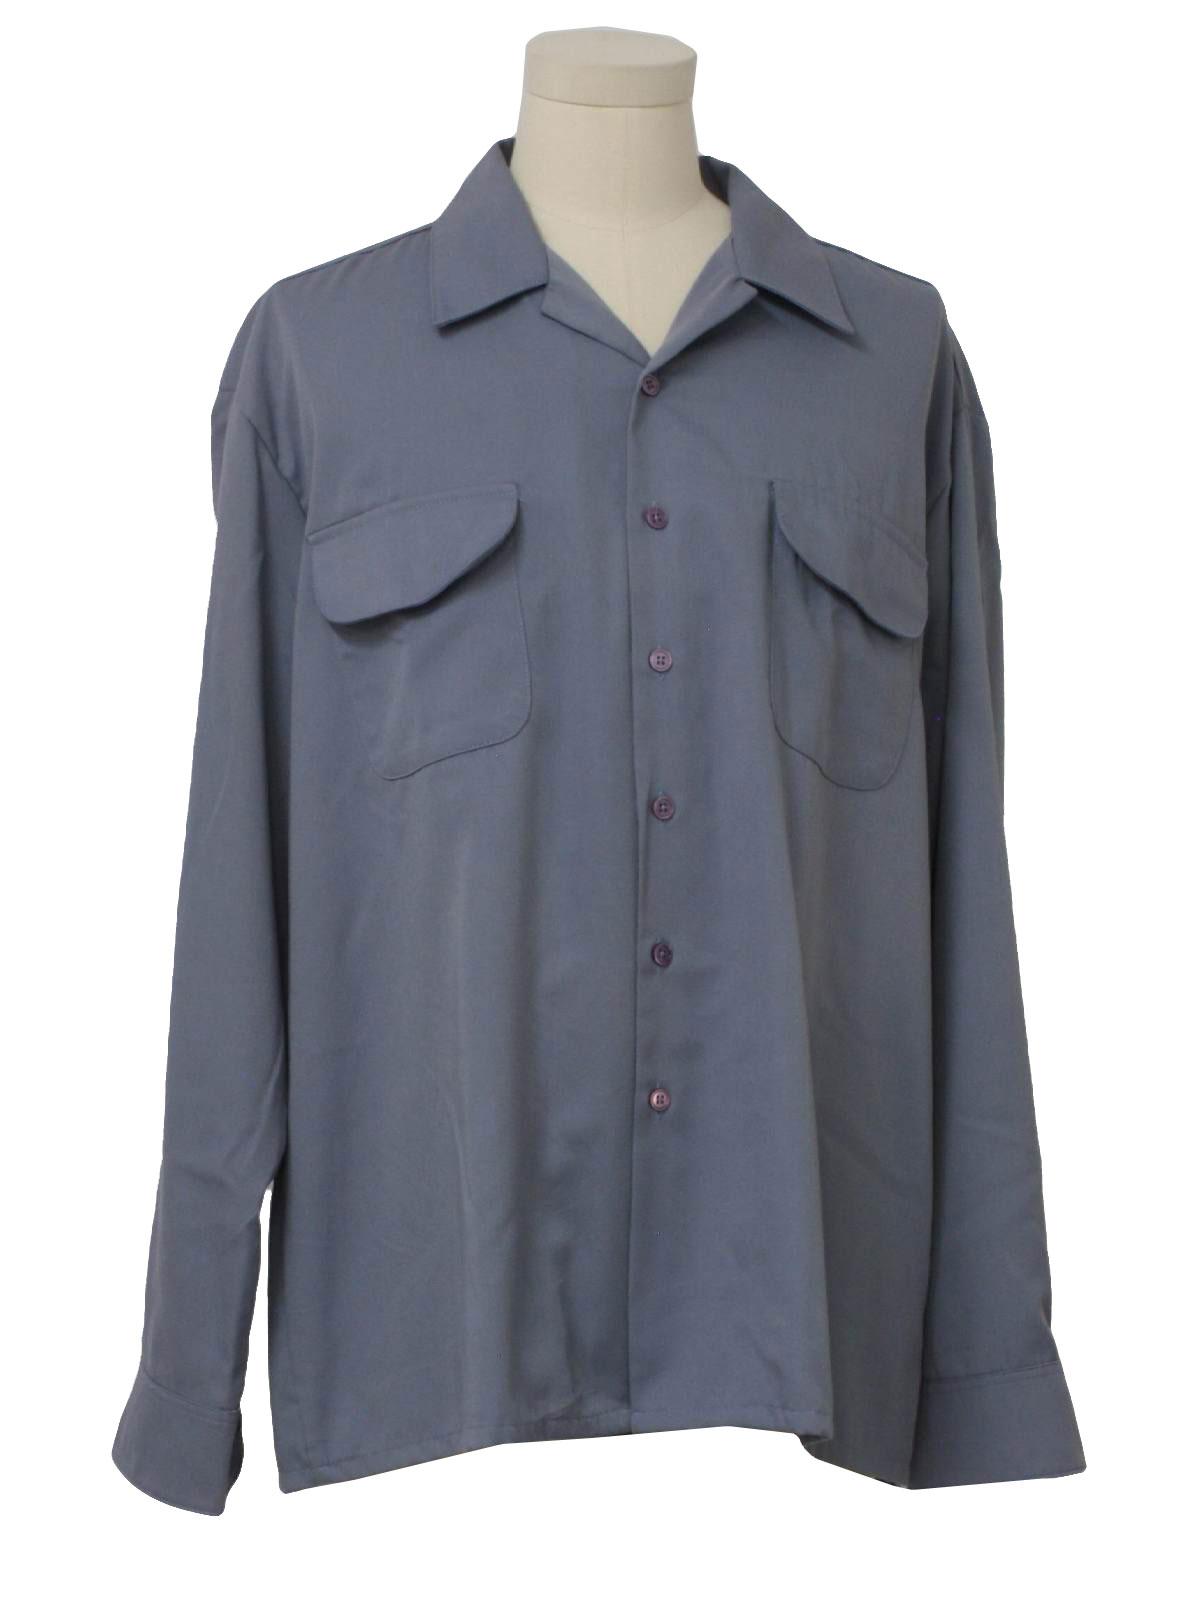 Retro 1950s Gabardine Shirt 50s Made In 90s Kennington Mens